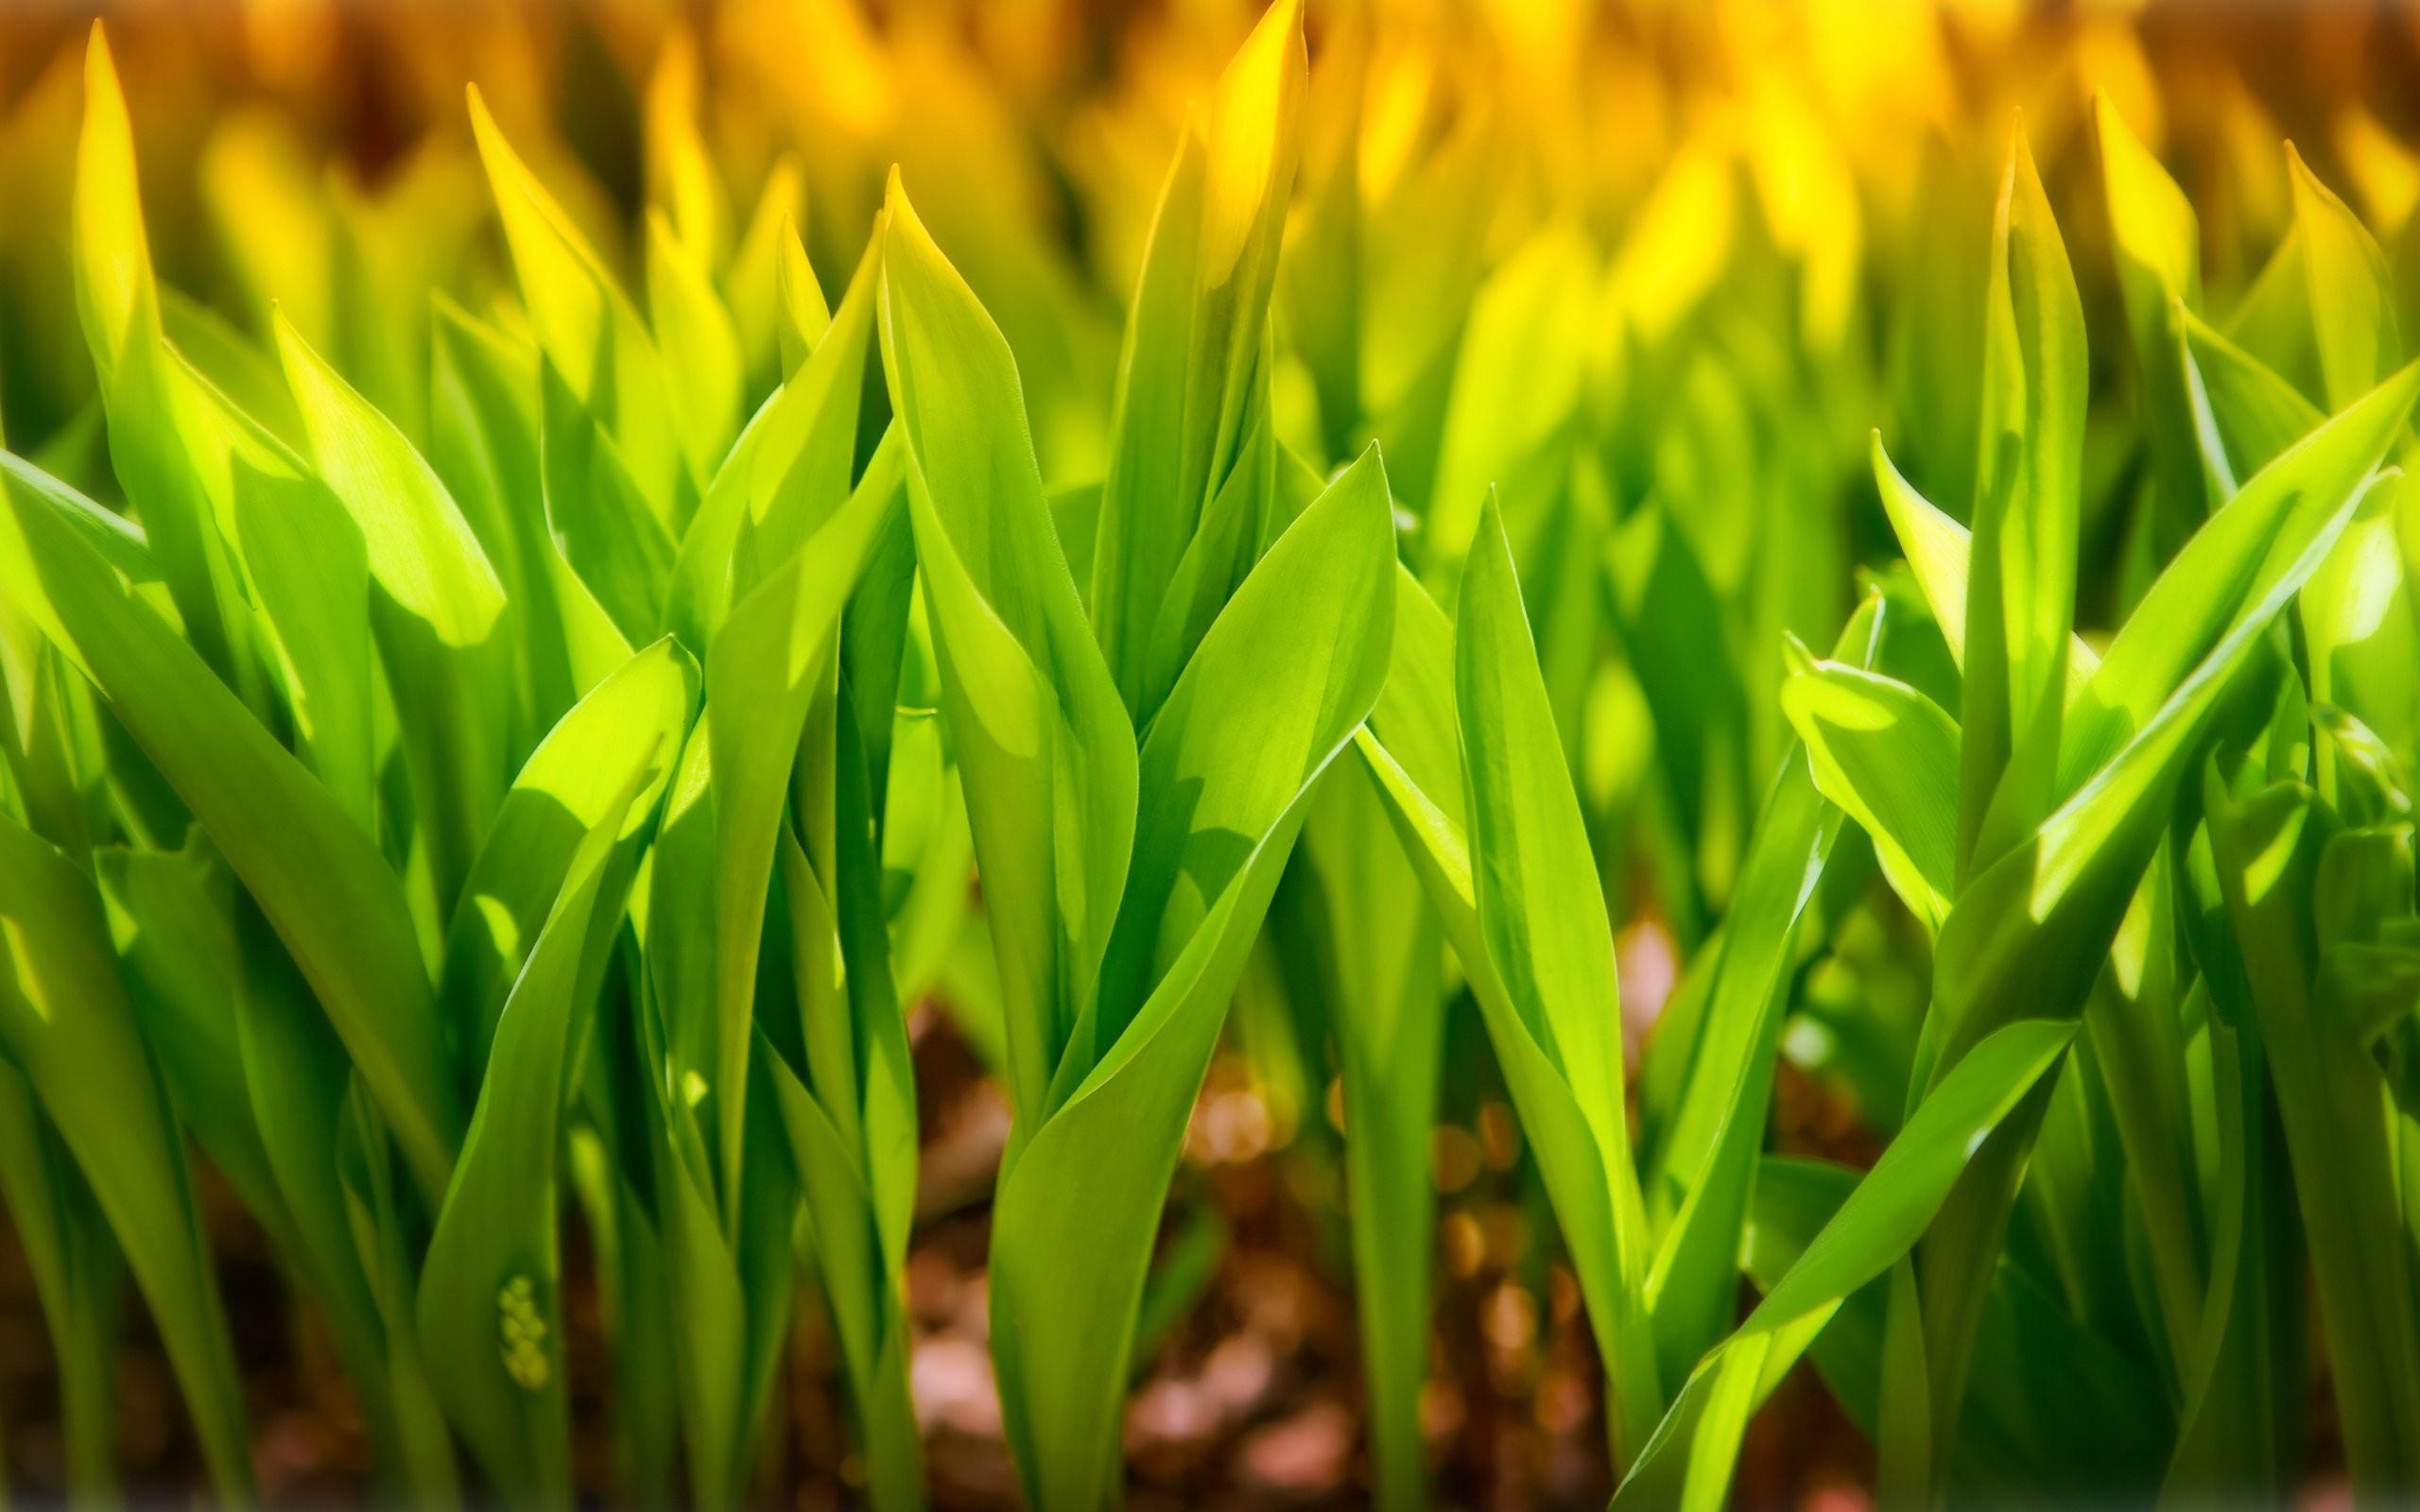 Plantas Verdes Display Naturalezacool Images Nature Wallpaper 2560x1600